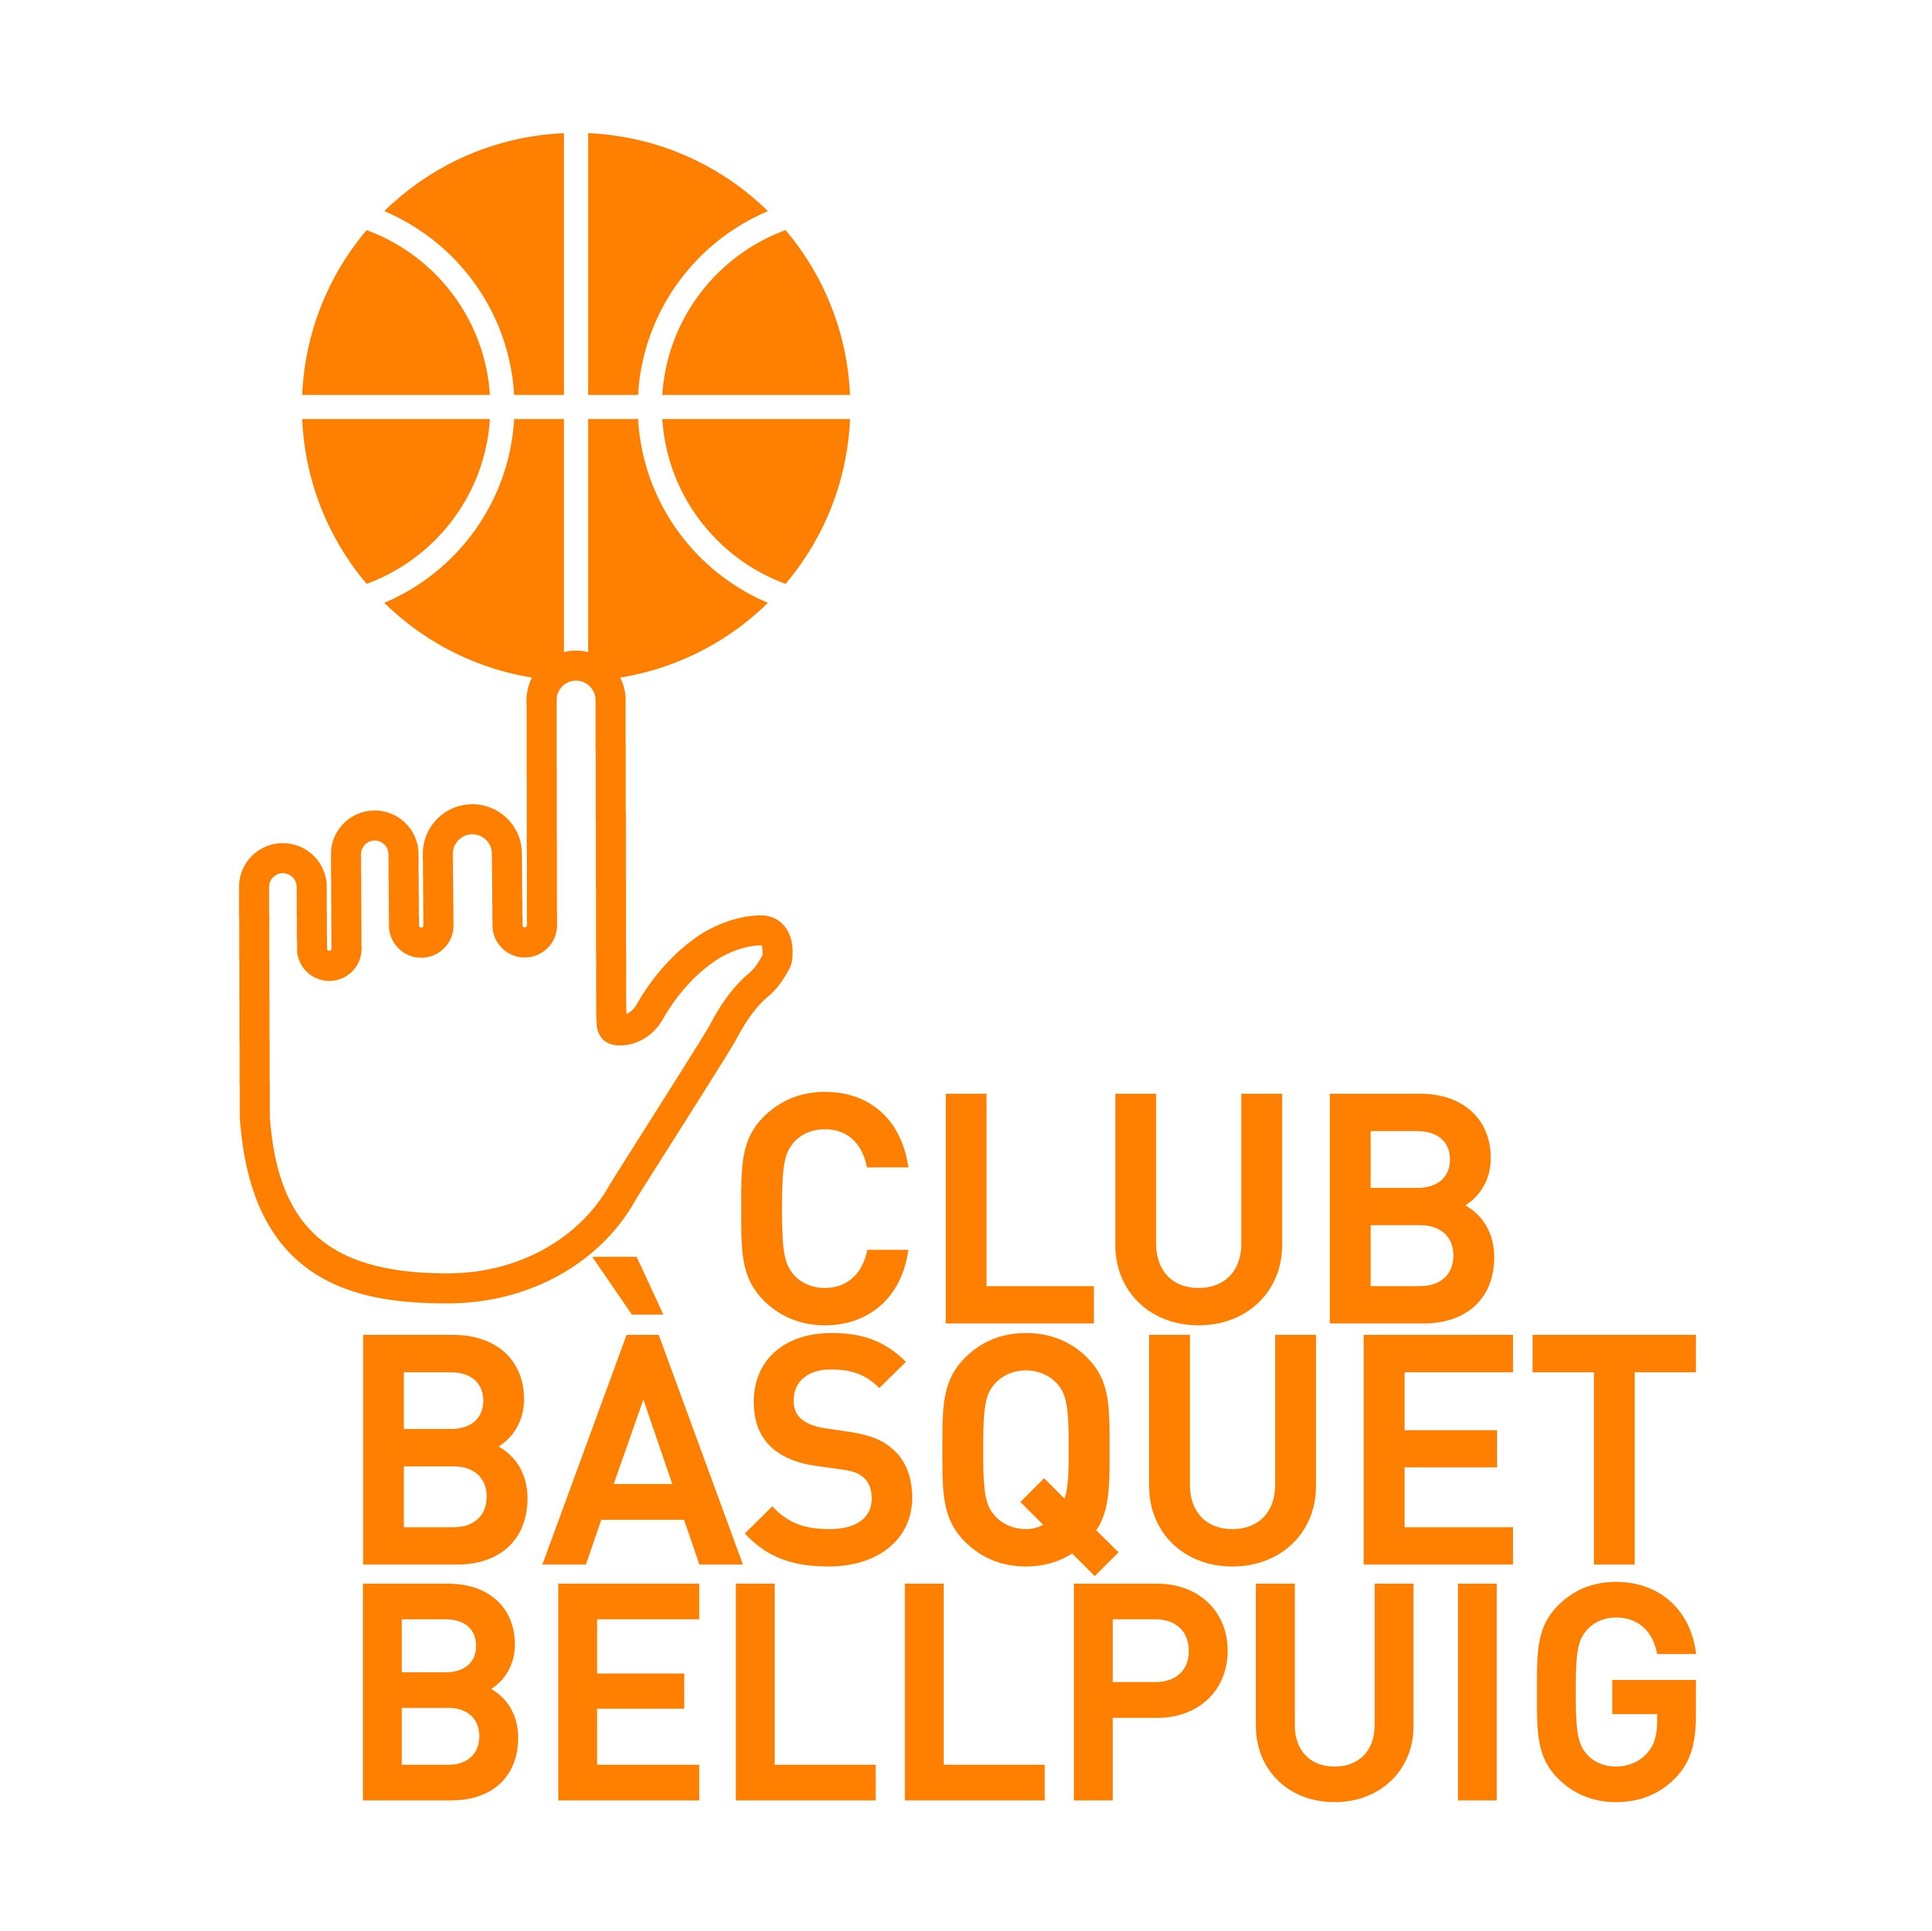 CLUB BASQUET BELLPUIG